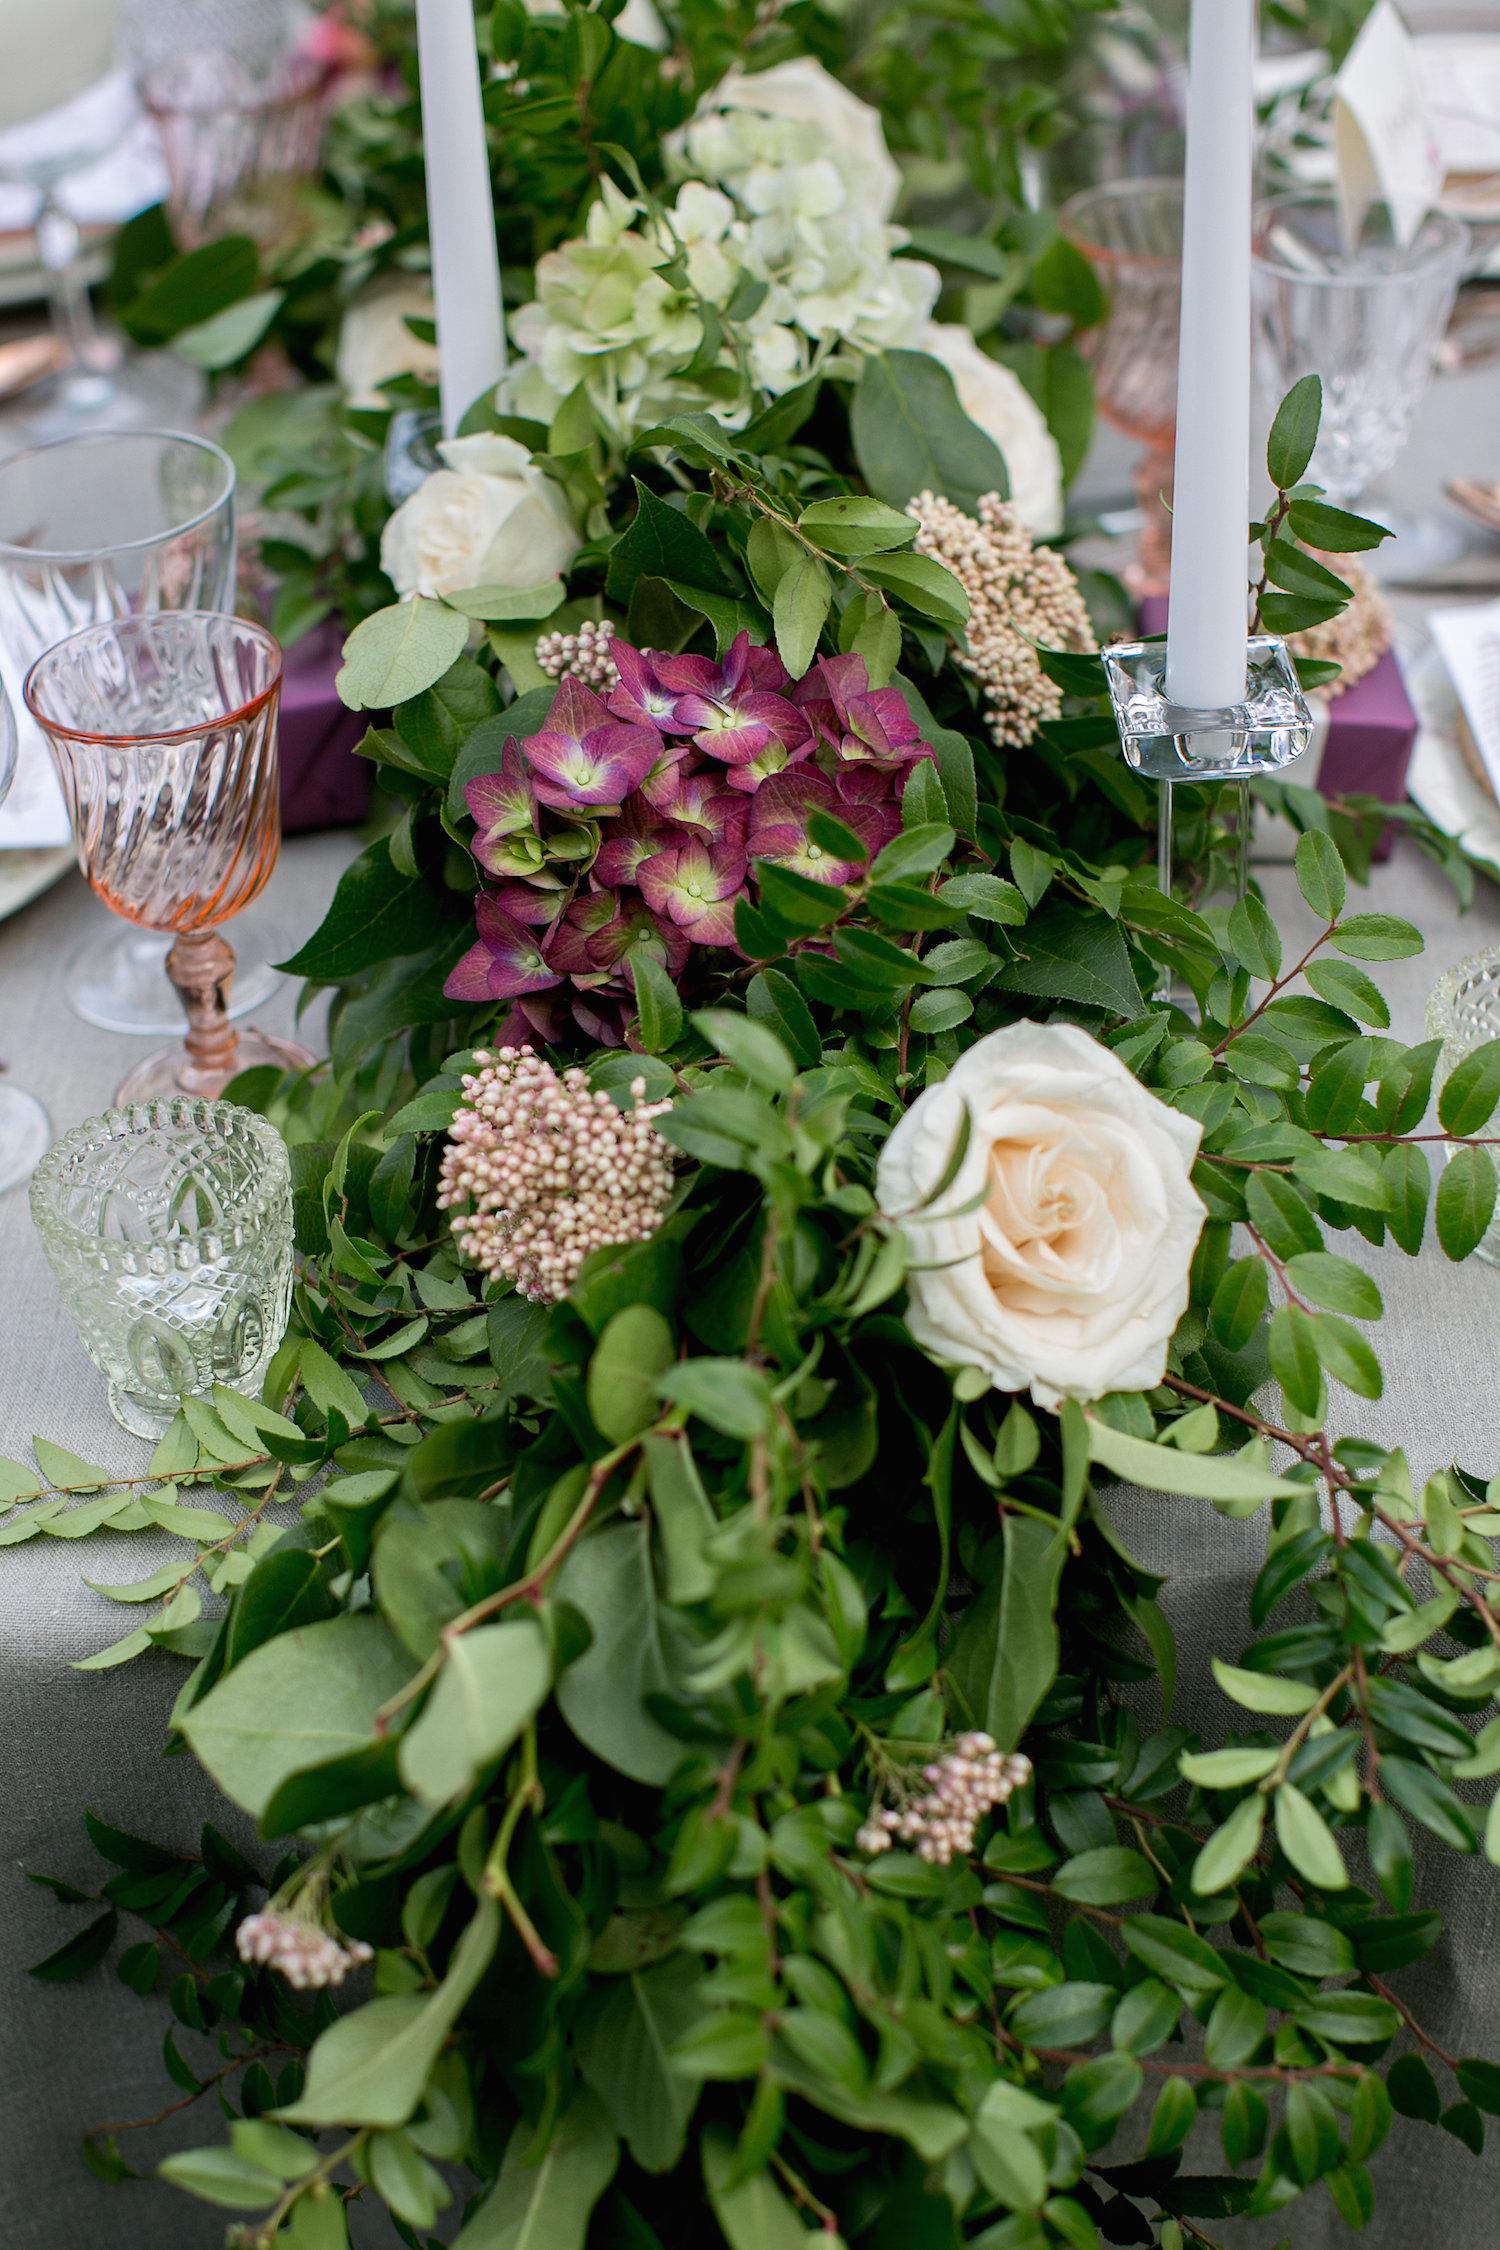 Wedding centerpiece garland by San Diego florist, Compass Floral.